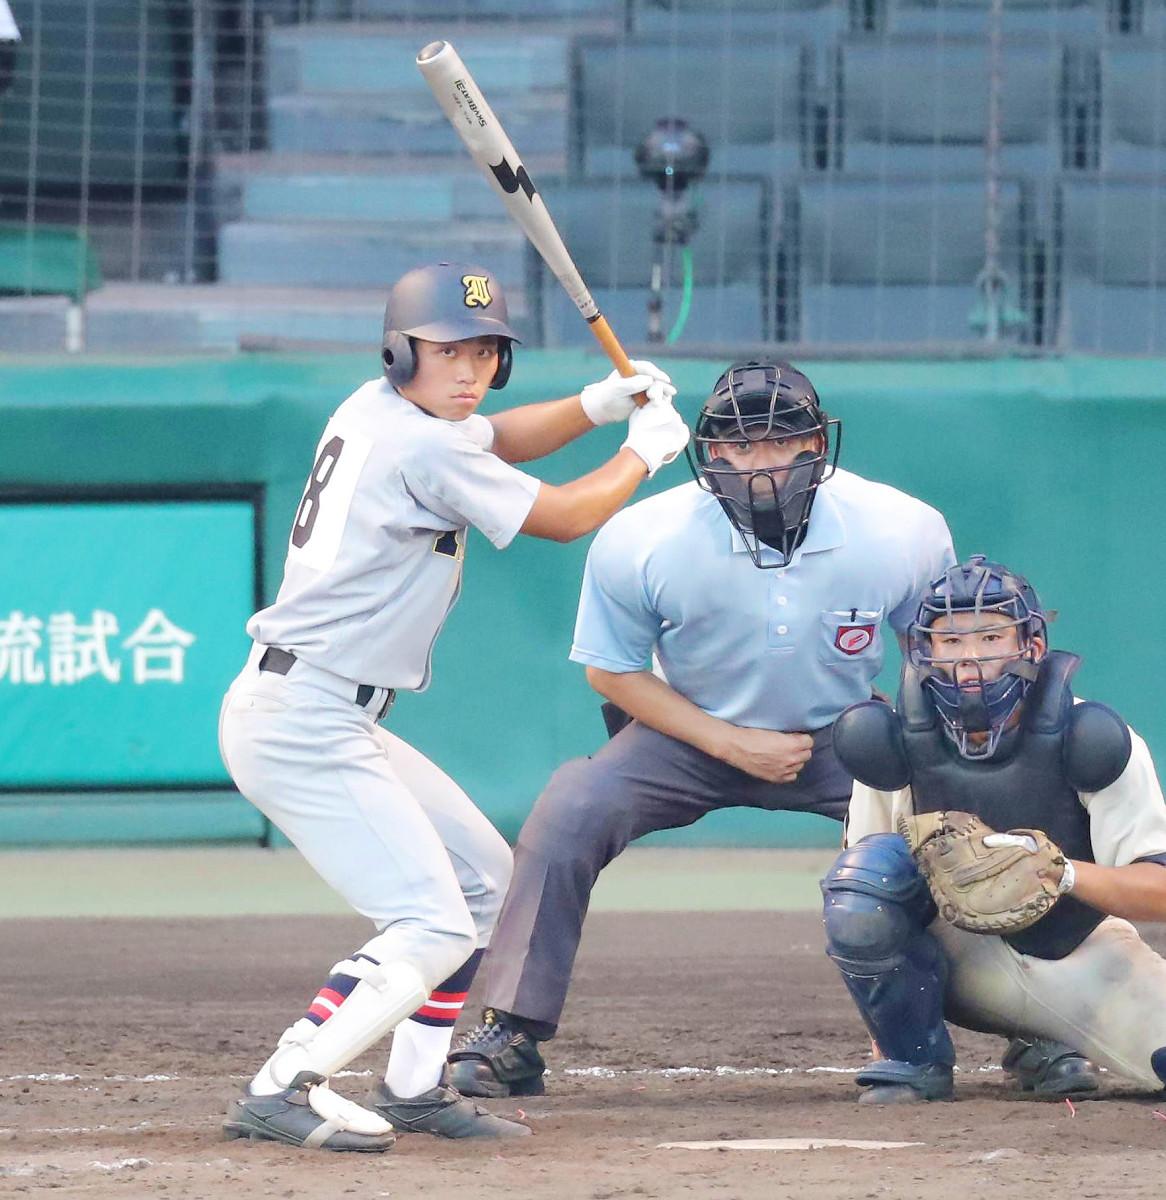 9回1死、代打出場した松本京太郎